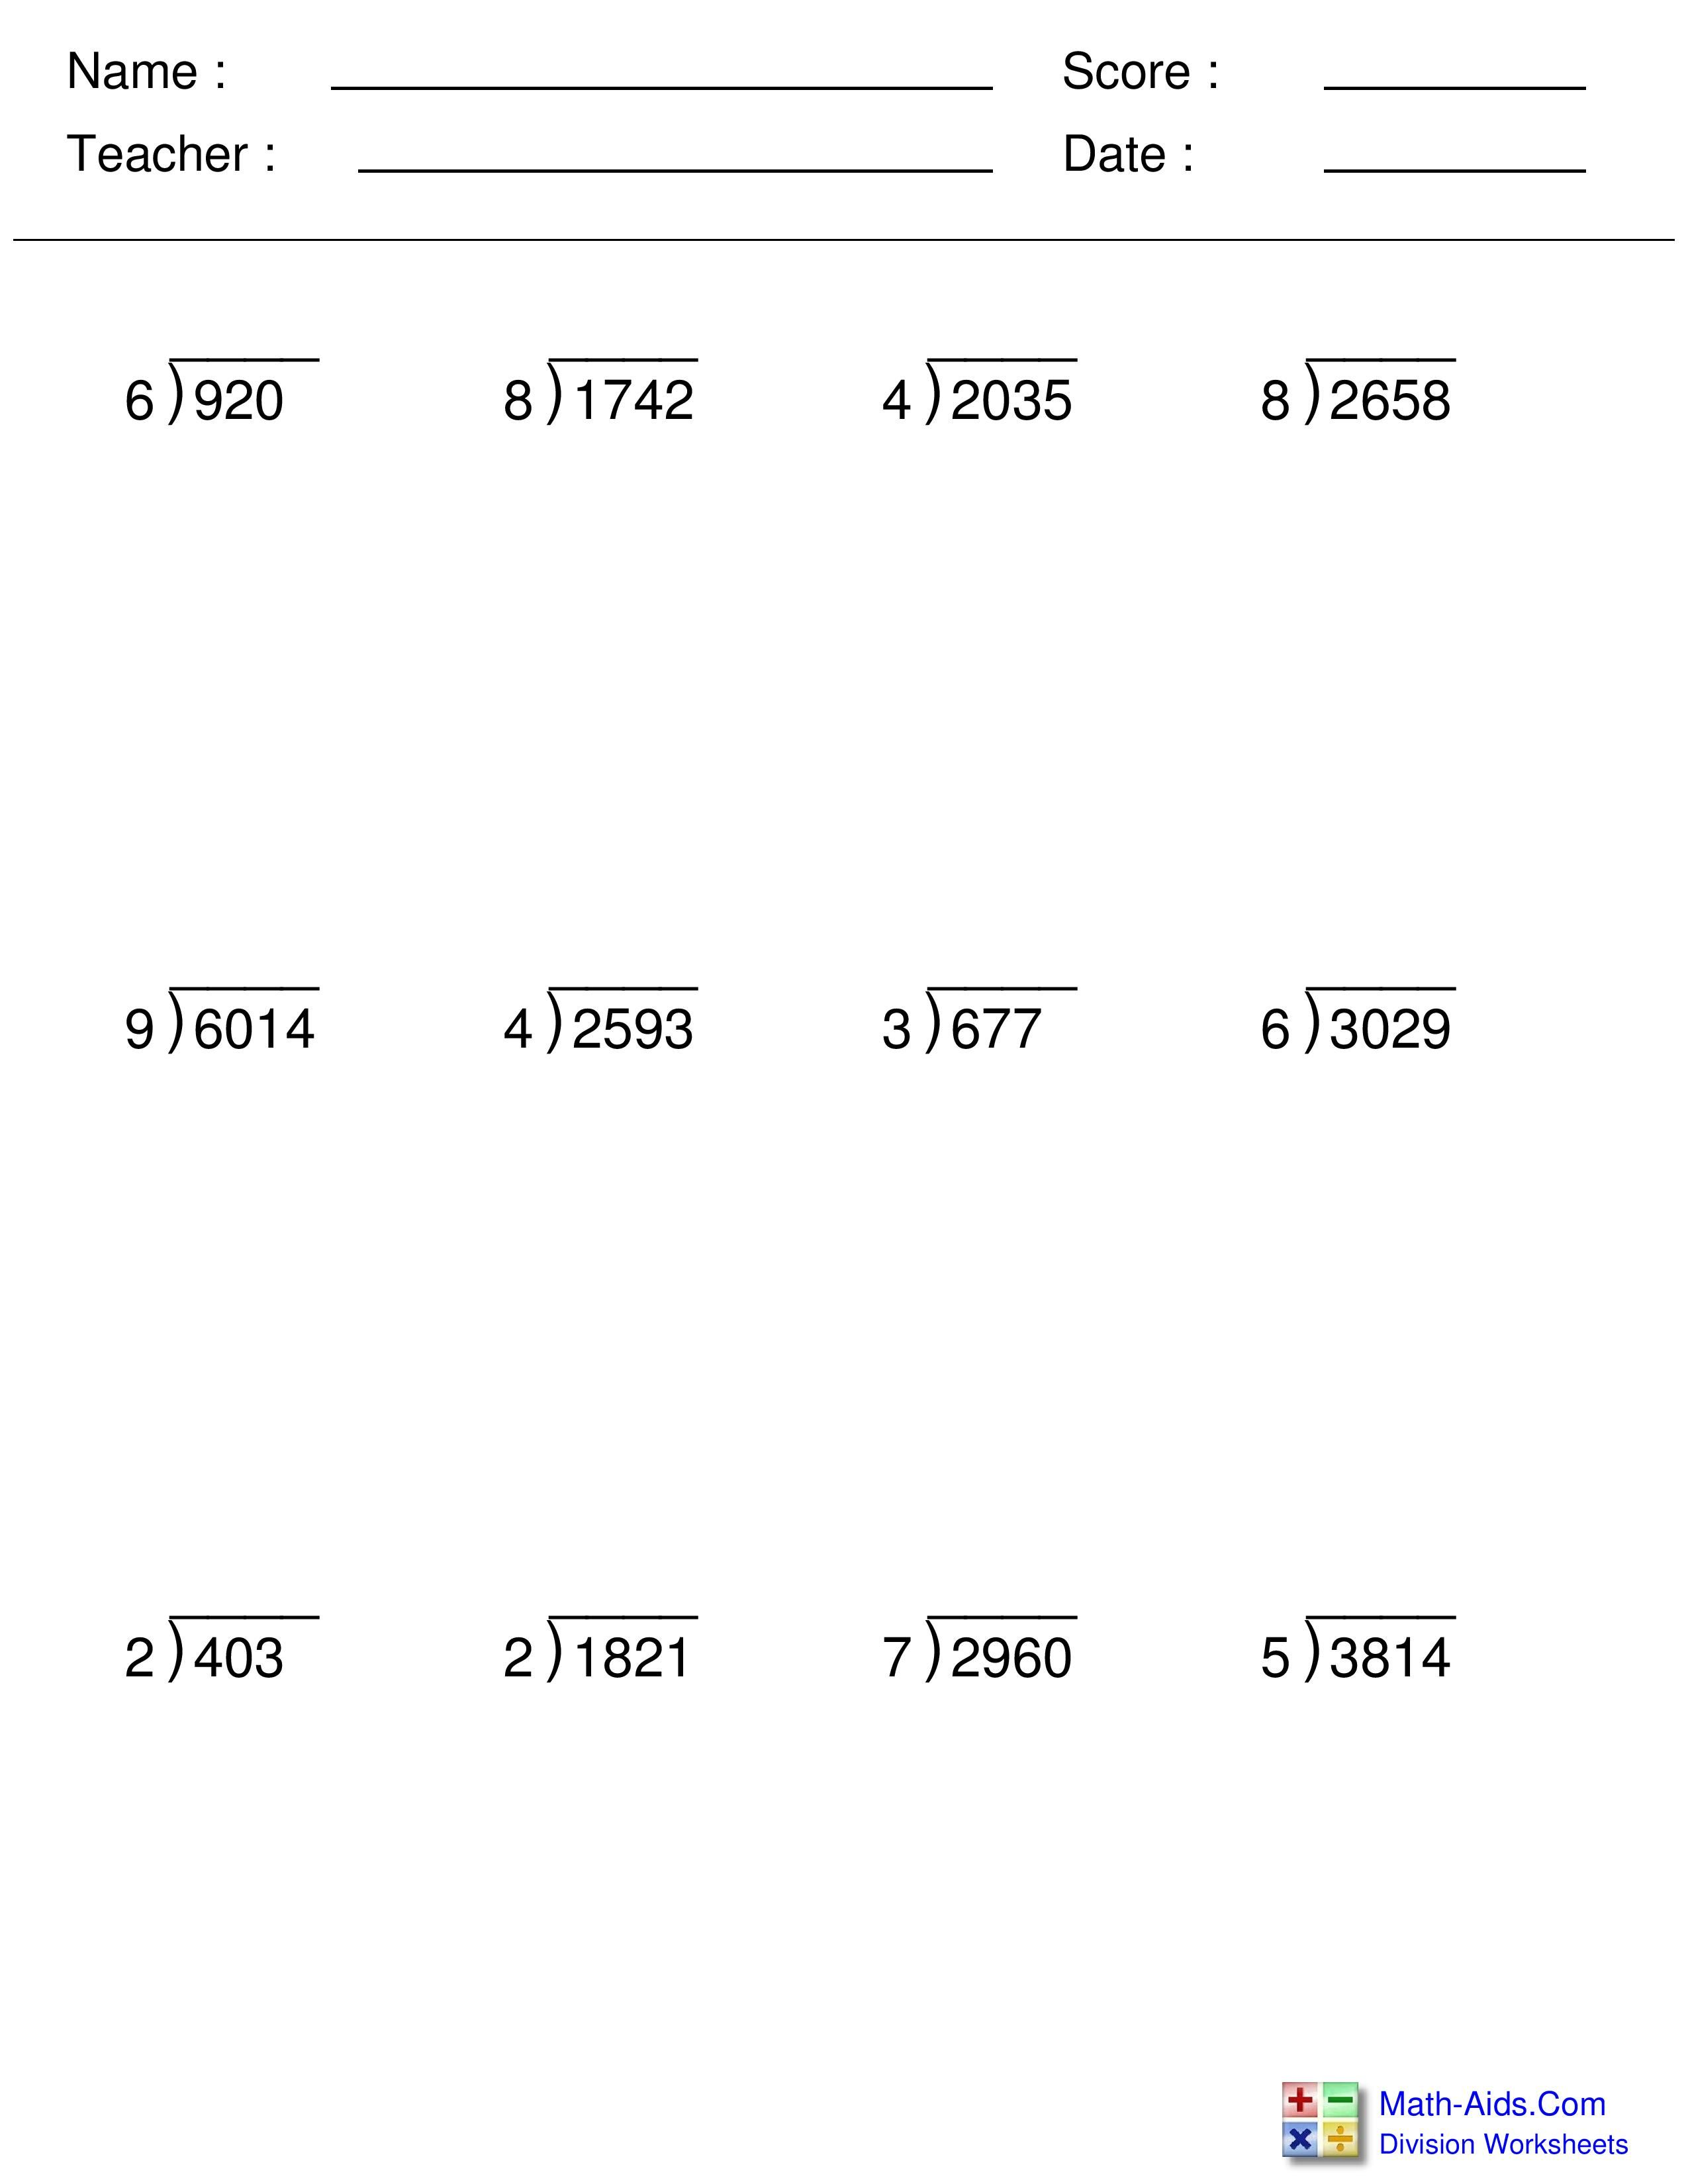 Best 15 Long Division Worksheet You Calendars In 2021 Division Worksheets Long Division Worksheets Practices Worksheets [ 3300 x 2550 Pixel ]